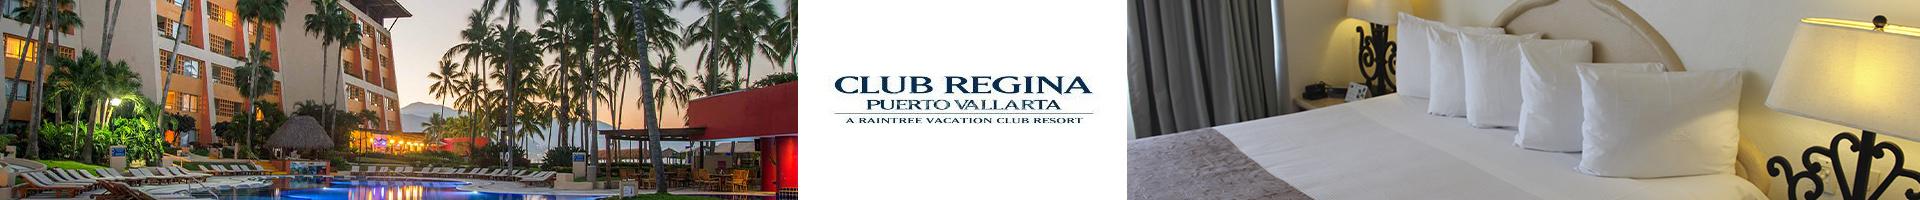 Banner club regina